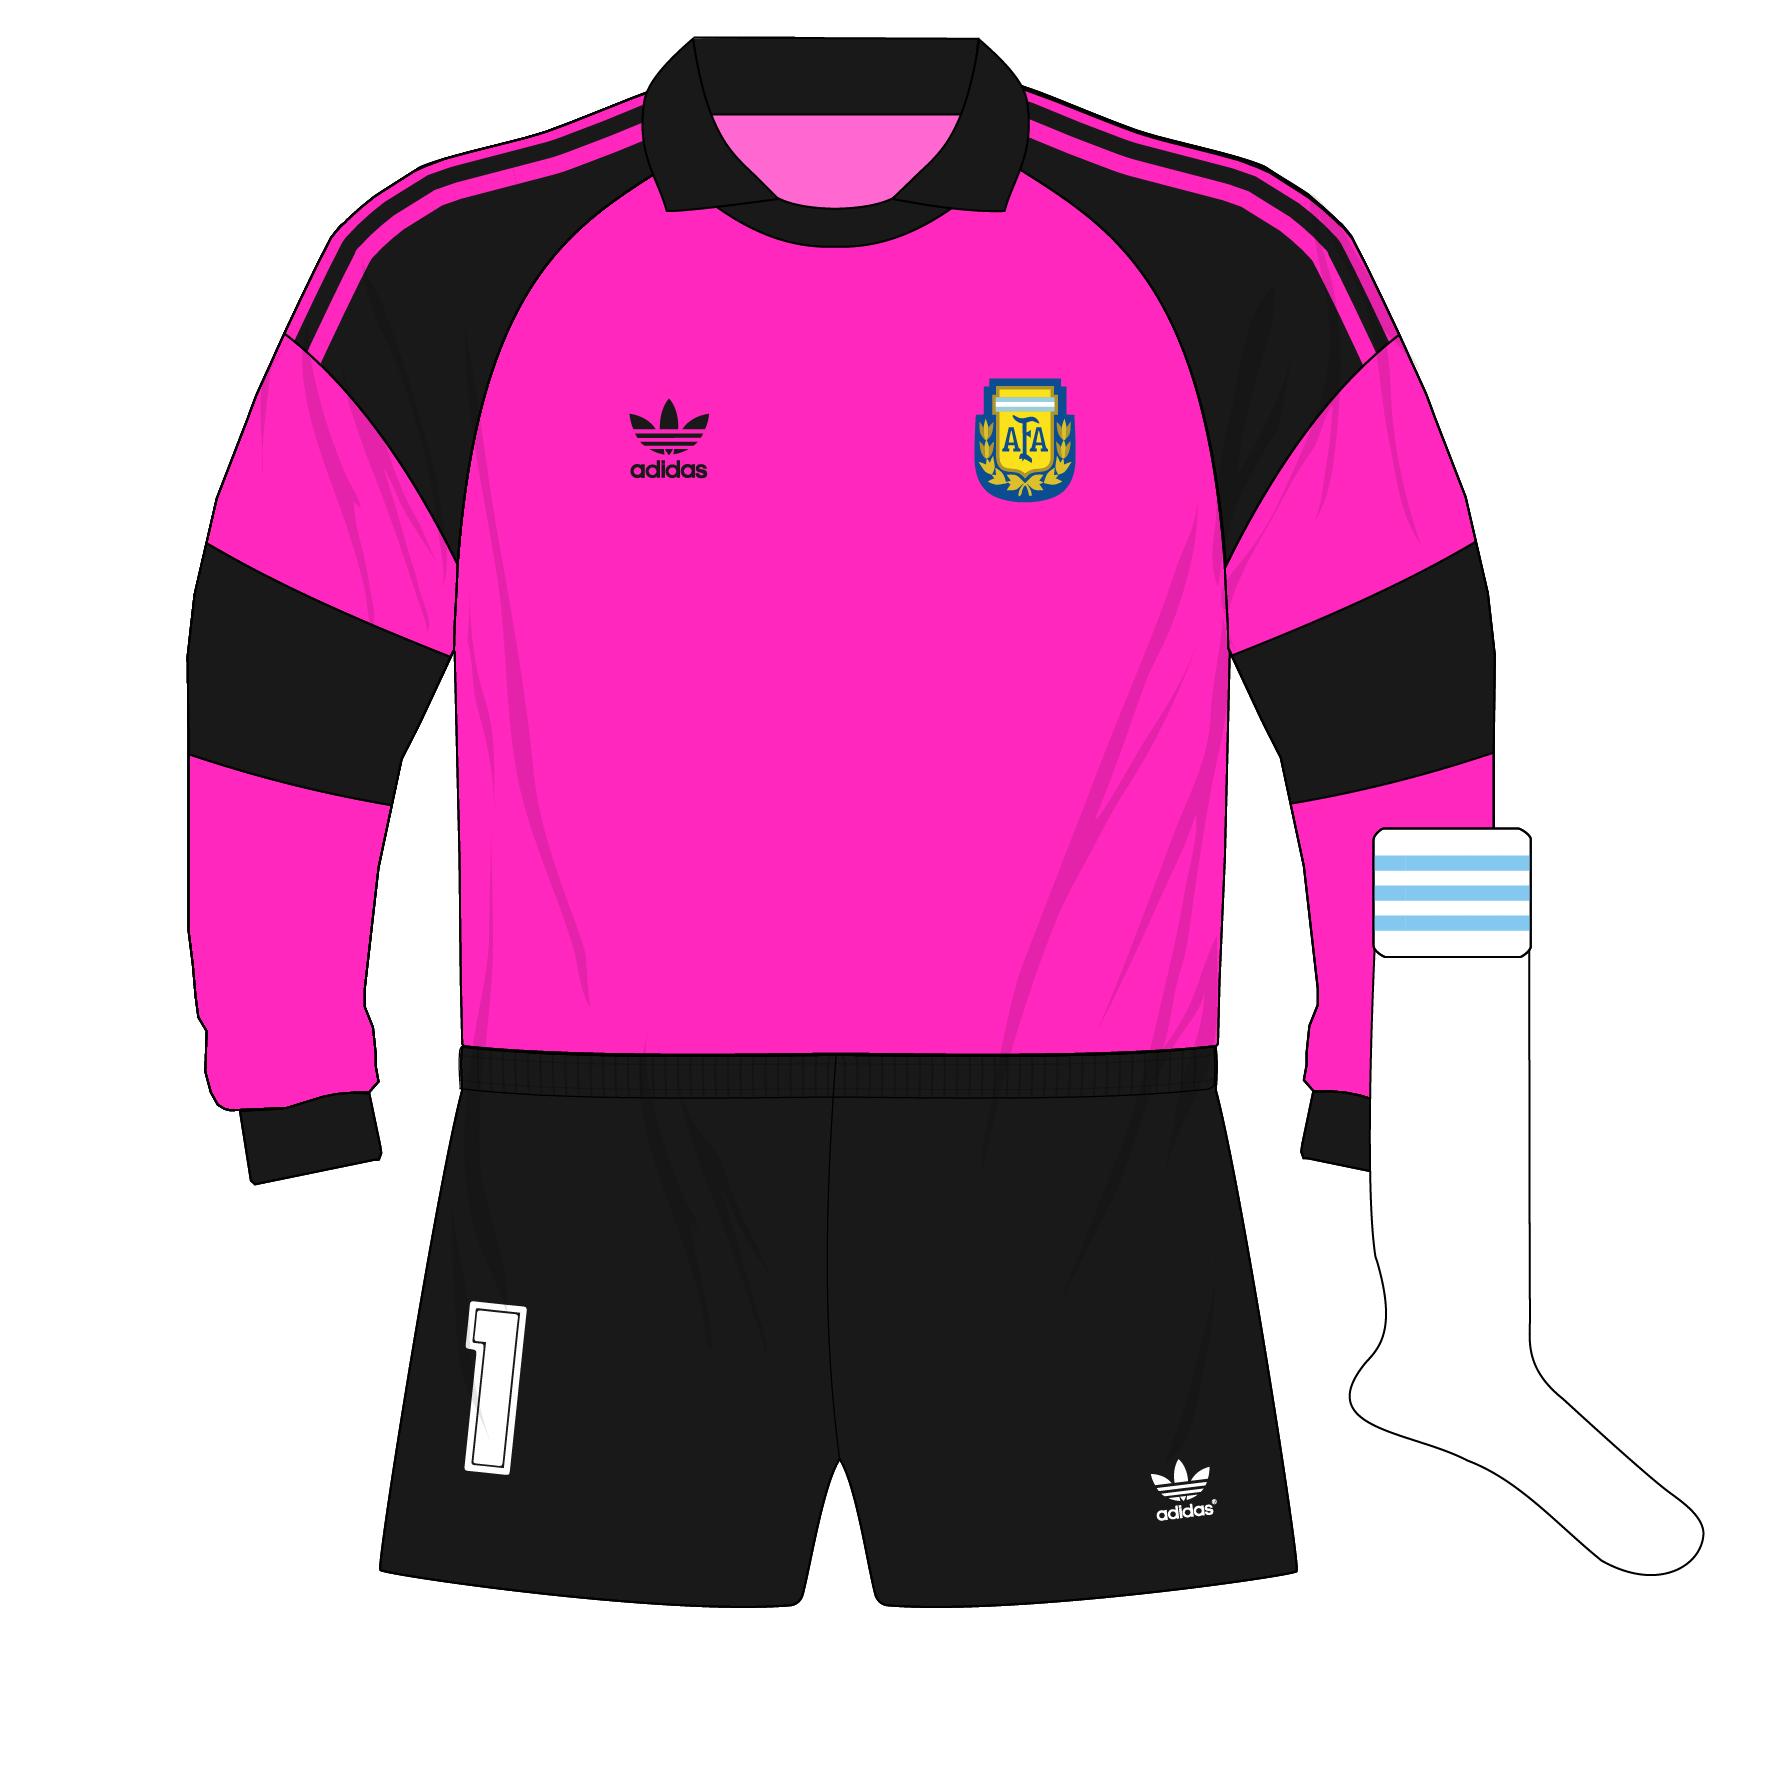 adidas-Argentina-portero-goalkeeper-camiseta-jersey-1991-Goycochea-pink